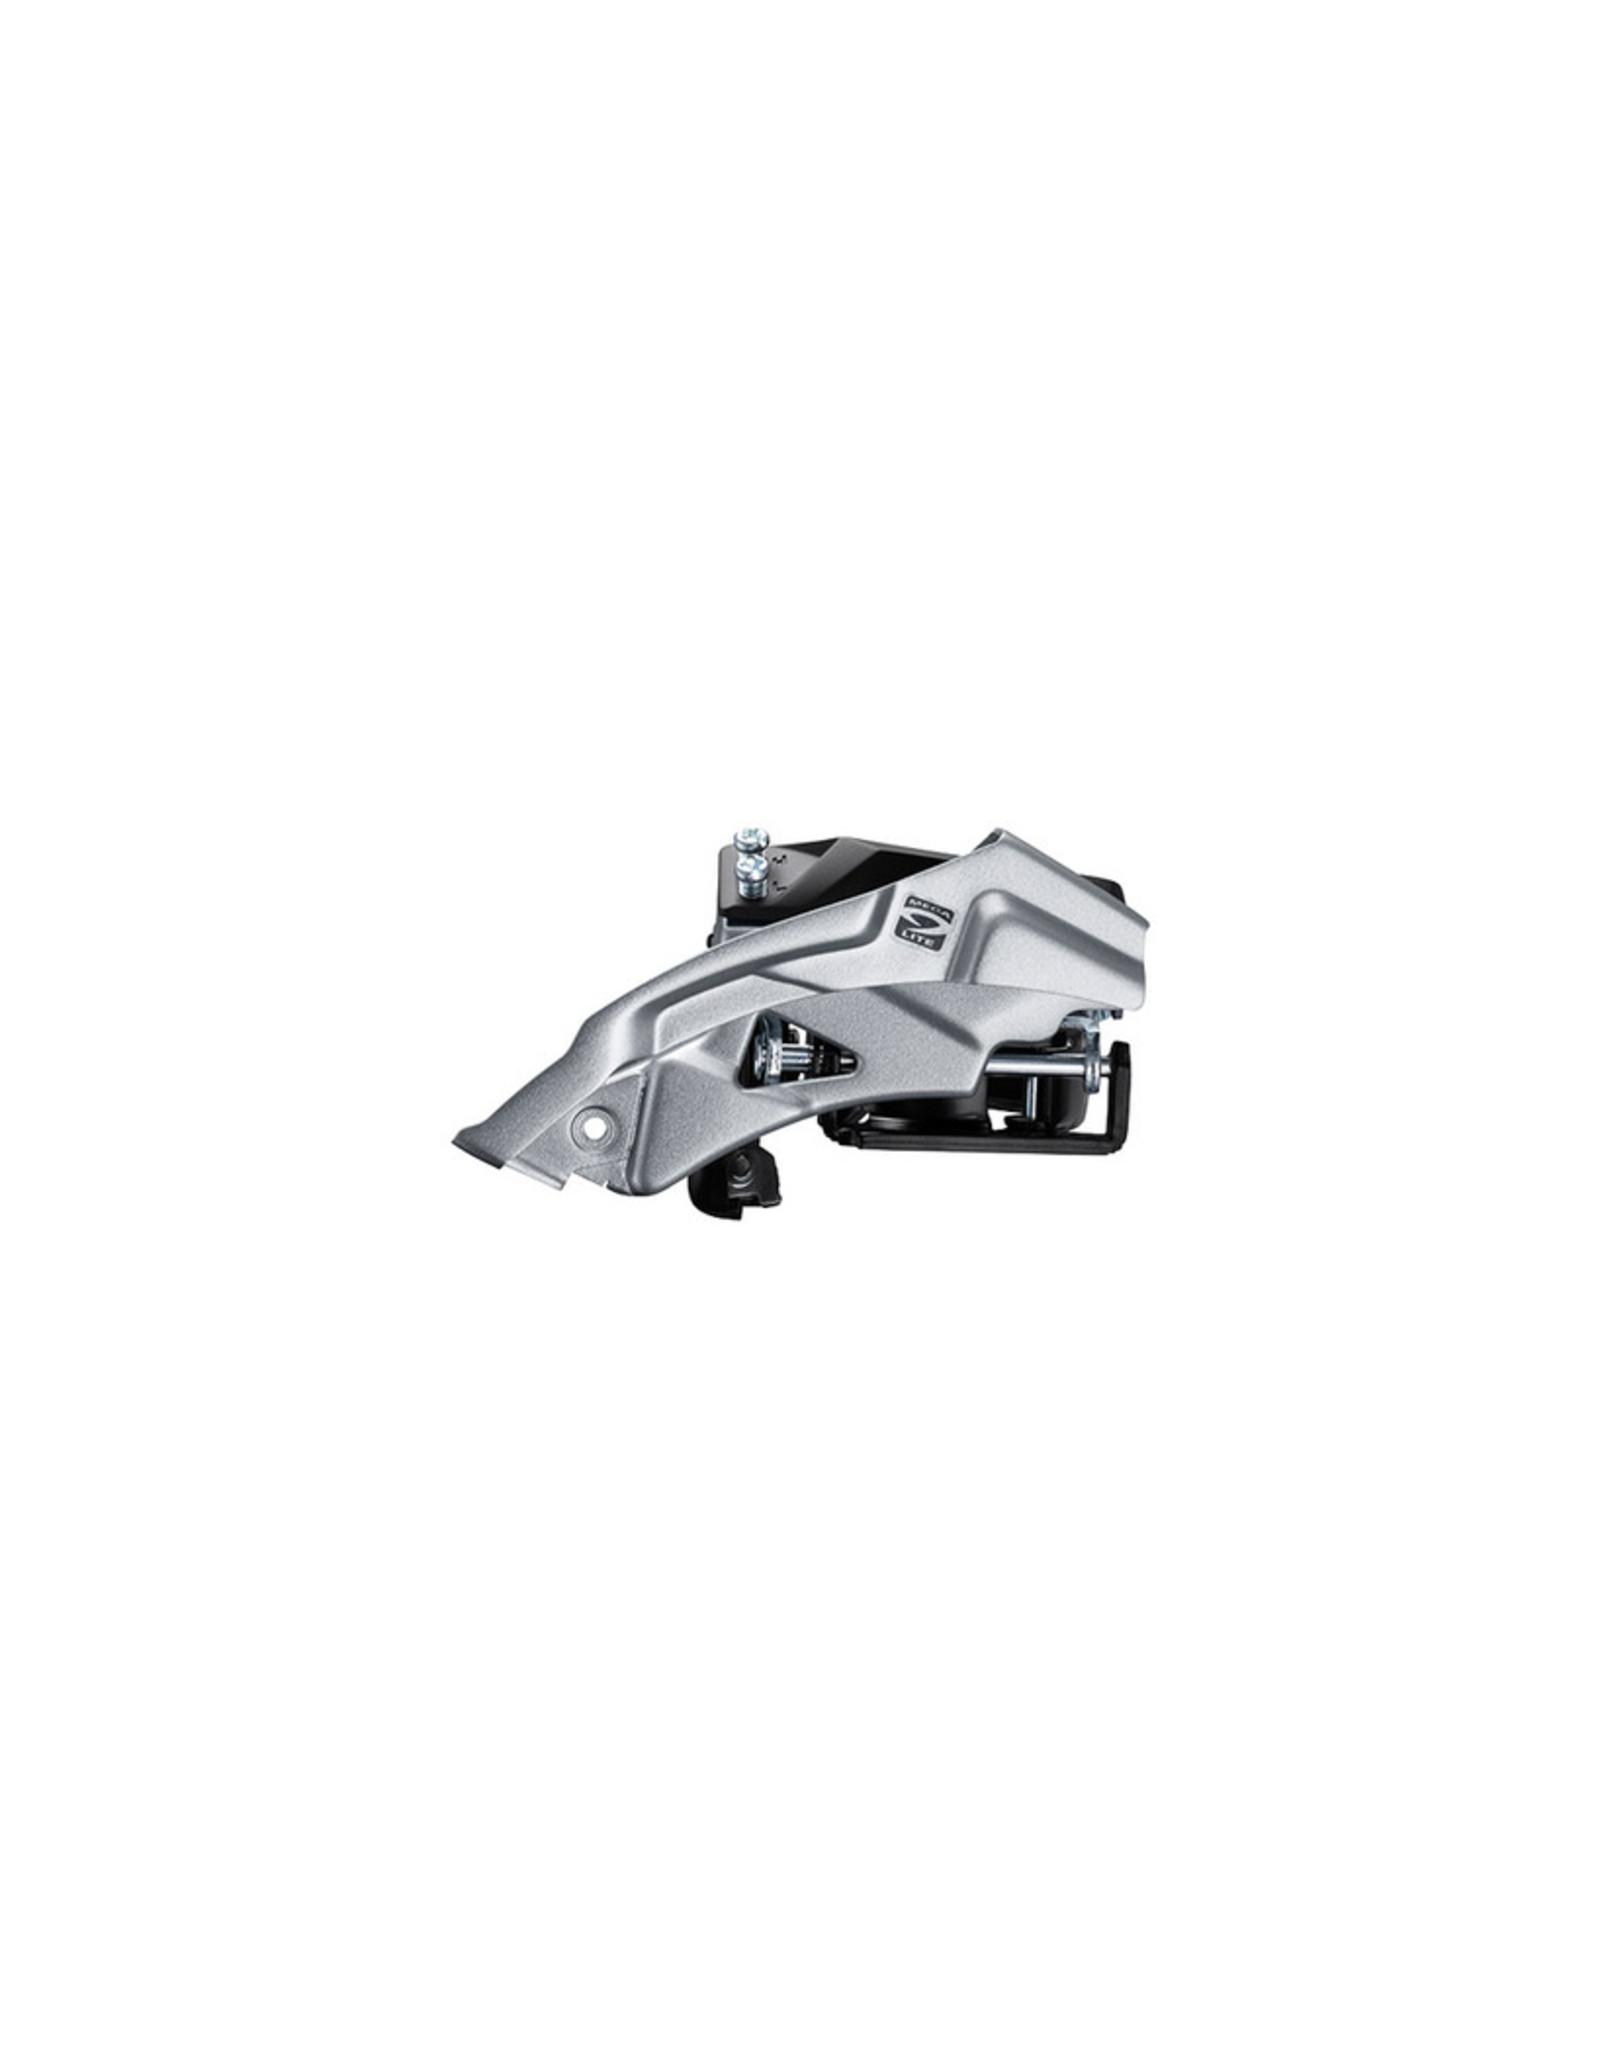 SHIMANO Shimano Front Derailleur, FD-M2000, Altus, Down-Swing Dual-Pull, For 3 x 9